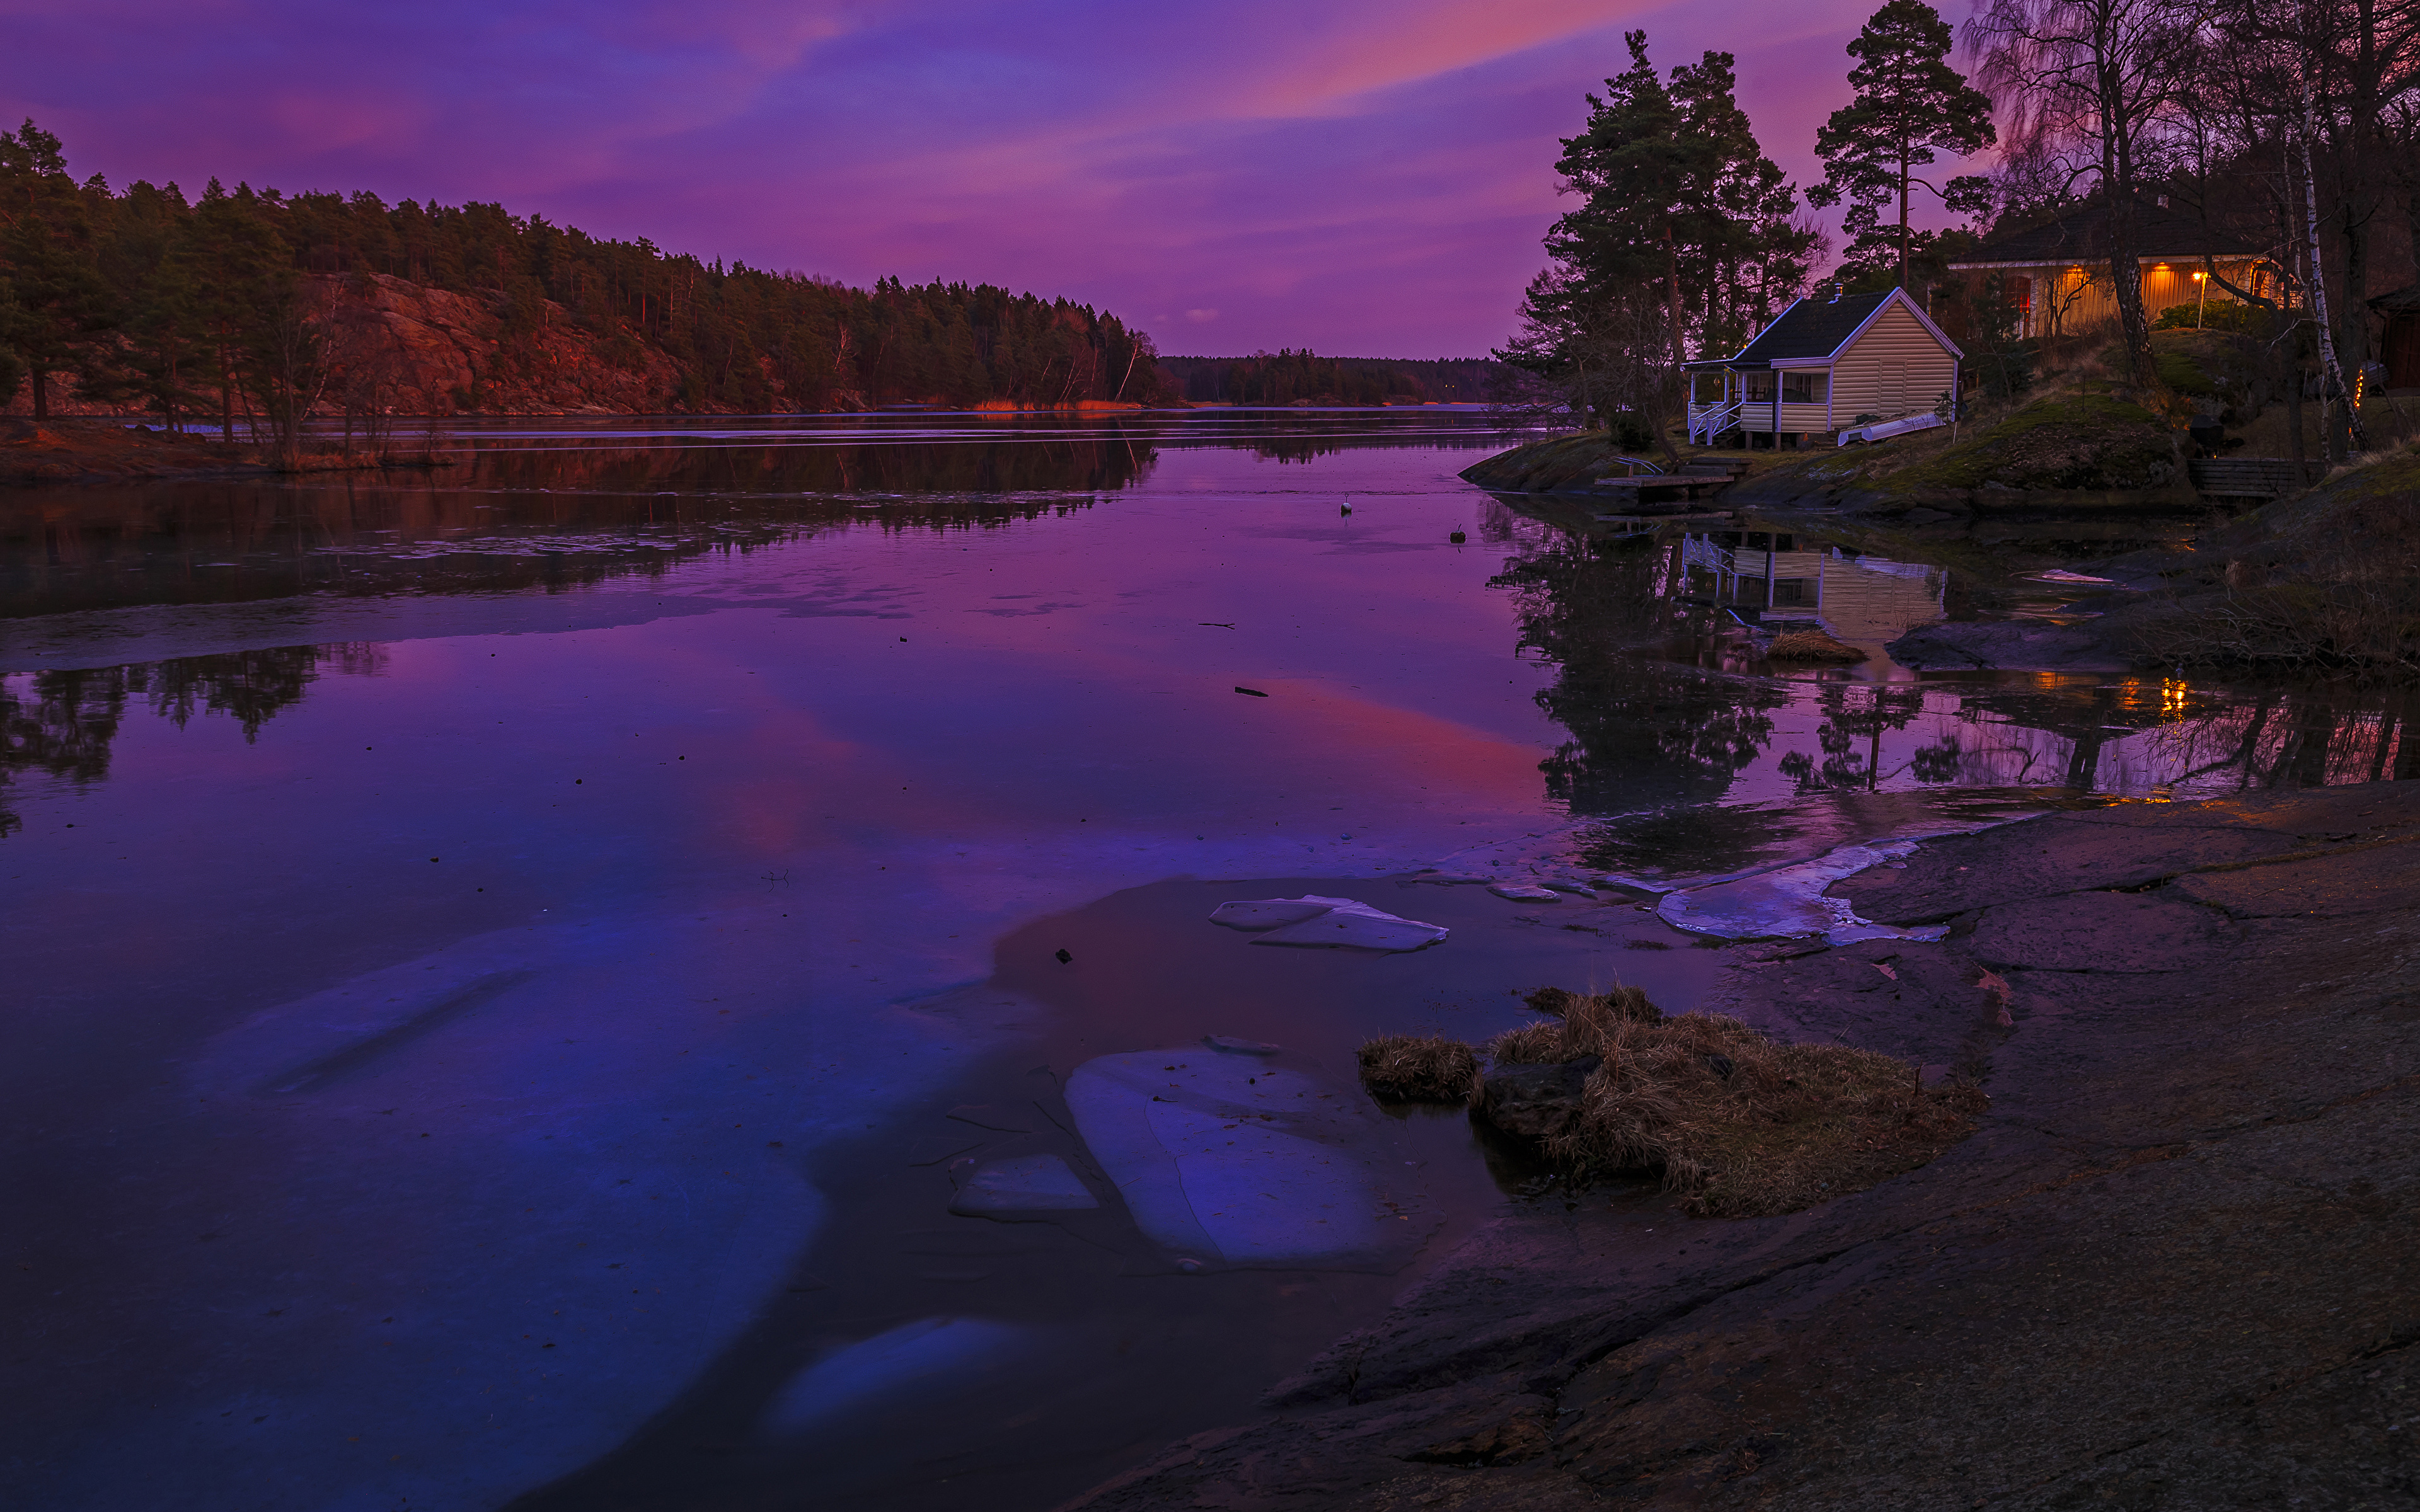 Обои месяц, финляндия. Природа foto 10